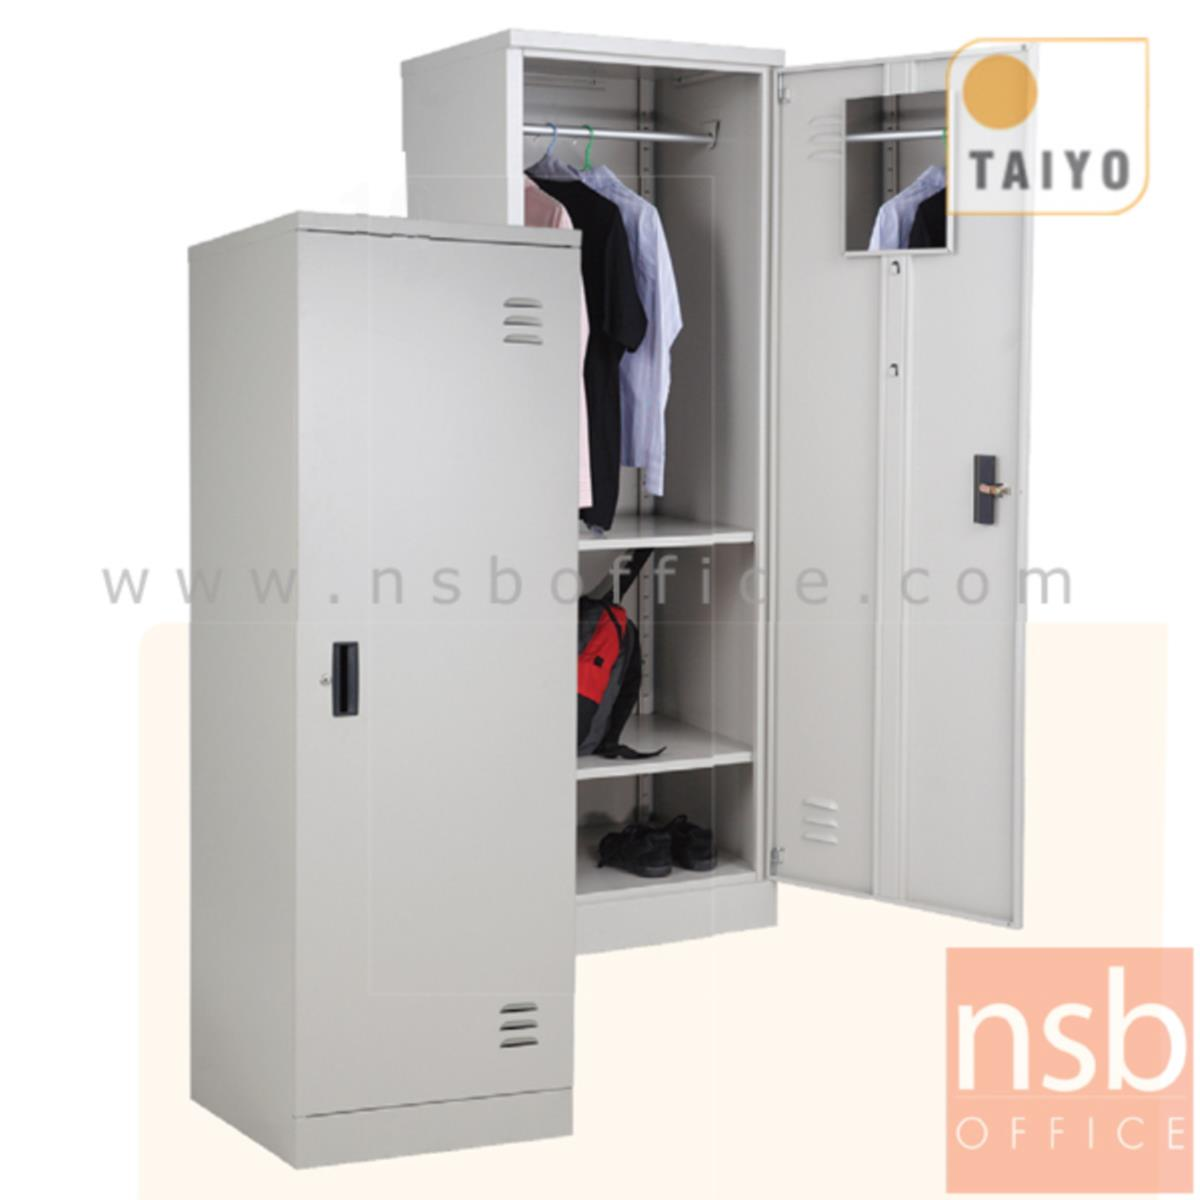 E08A013:ตู้เสื้อผ้าเหล็ก 1 บานเปิดเดี่ยว 60W*60D*180H cm (มีกระจกด้านใน) รุ่น WD72RWK